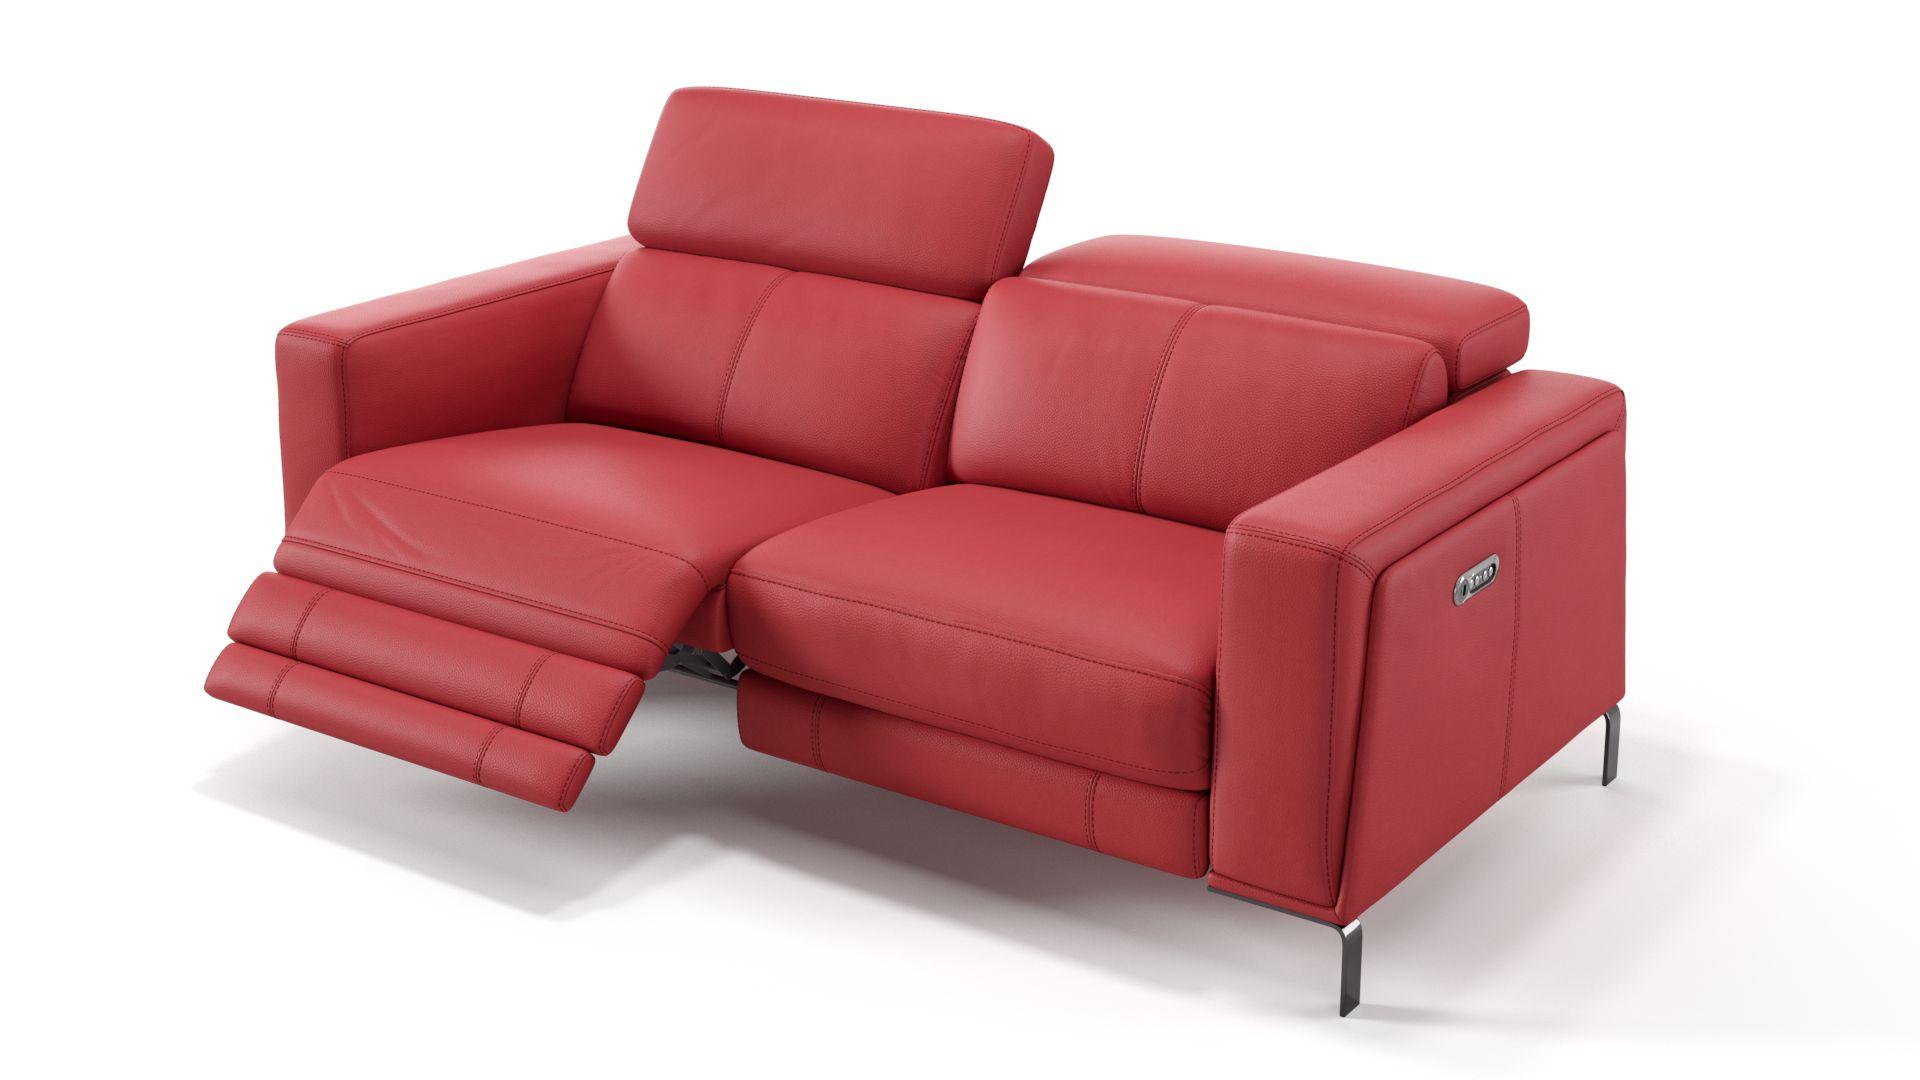 Full Size of Casoli Sofa Leder Relaxsofa 3 Sitzer Sofanella Lila Schilling Impressionen Big Kolonialstil Koinor Delife Heimkino Microfaser Relaxfunktion Günstig Kaufen Sofa Sofa Leder